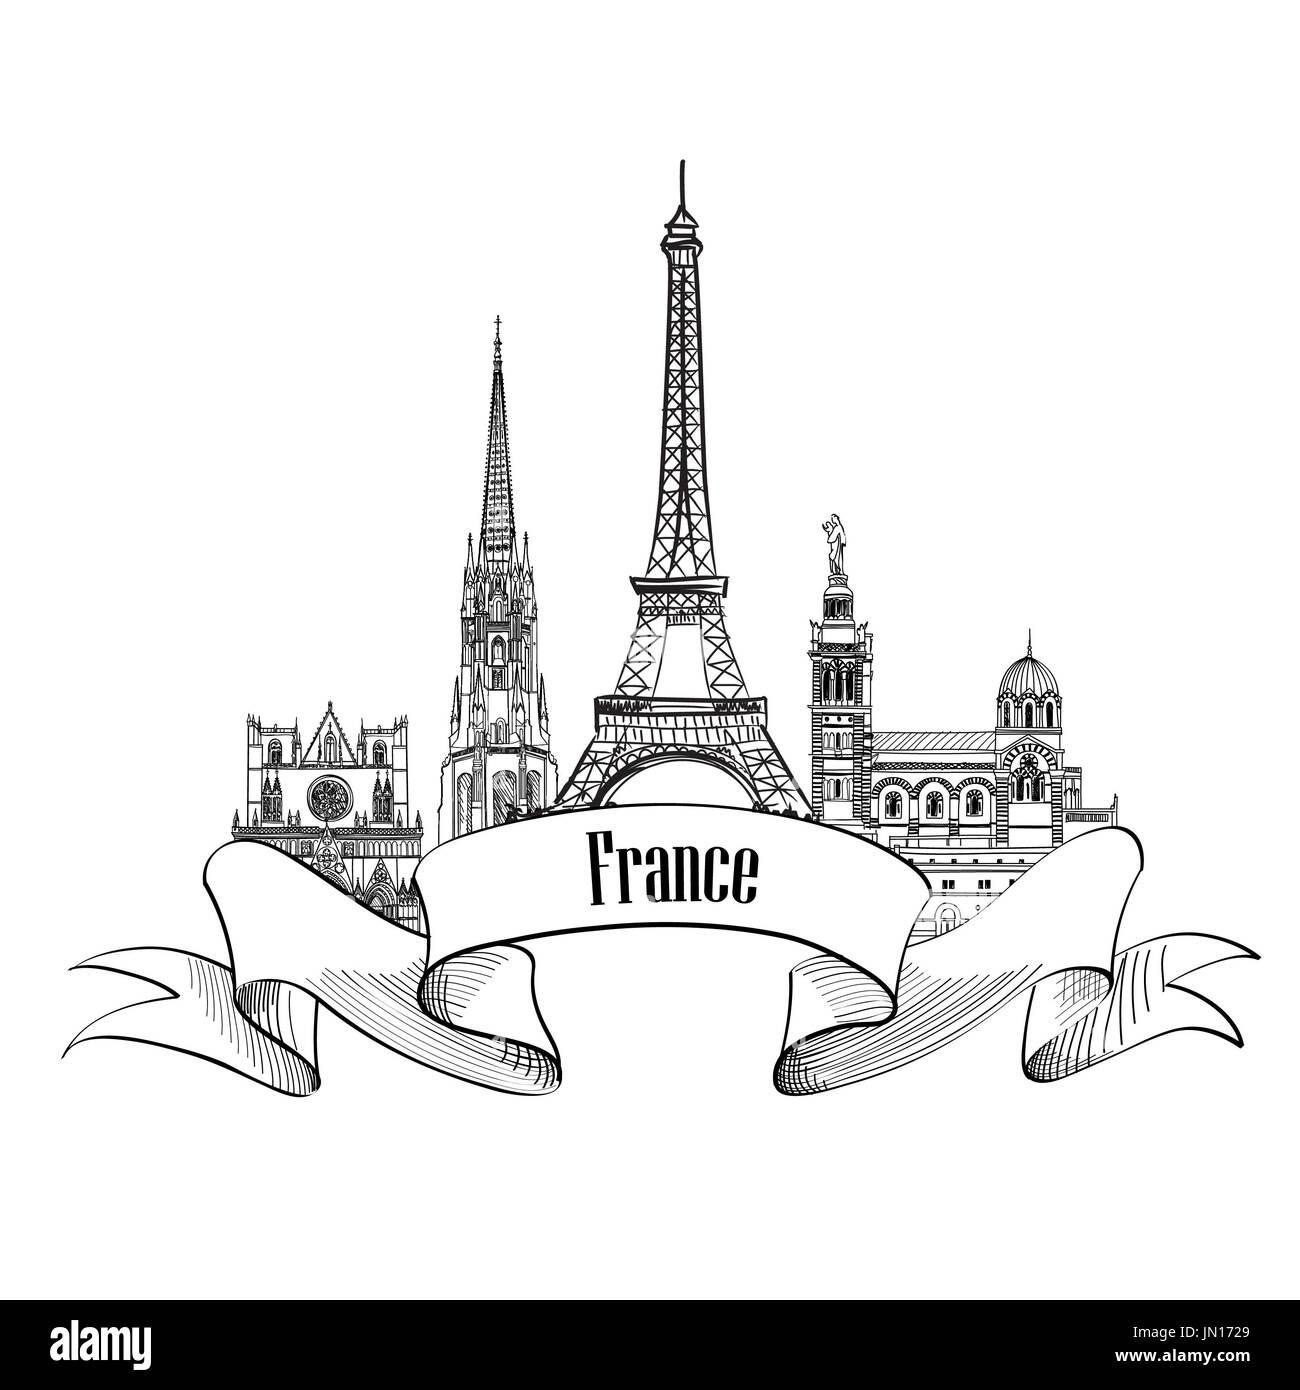 France label. Famous french architectural landmarks. Visit France banner. - Stock Image